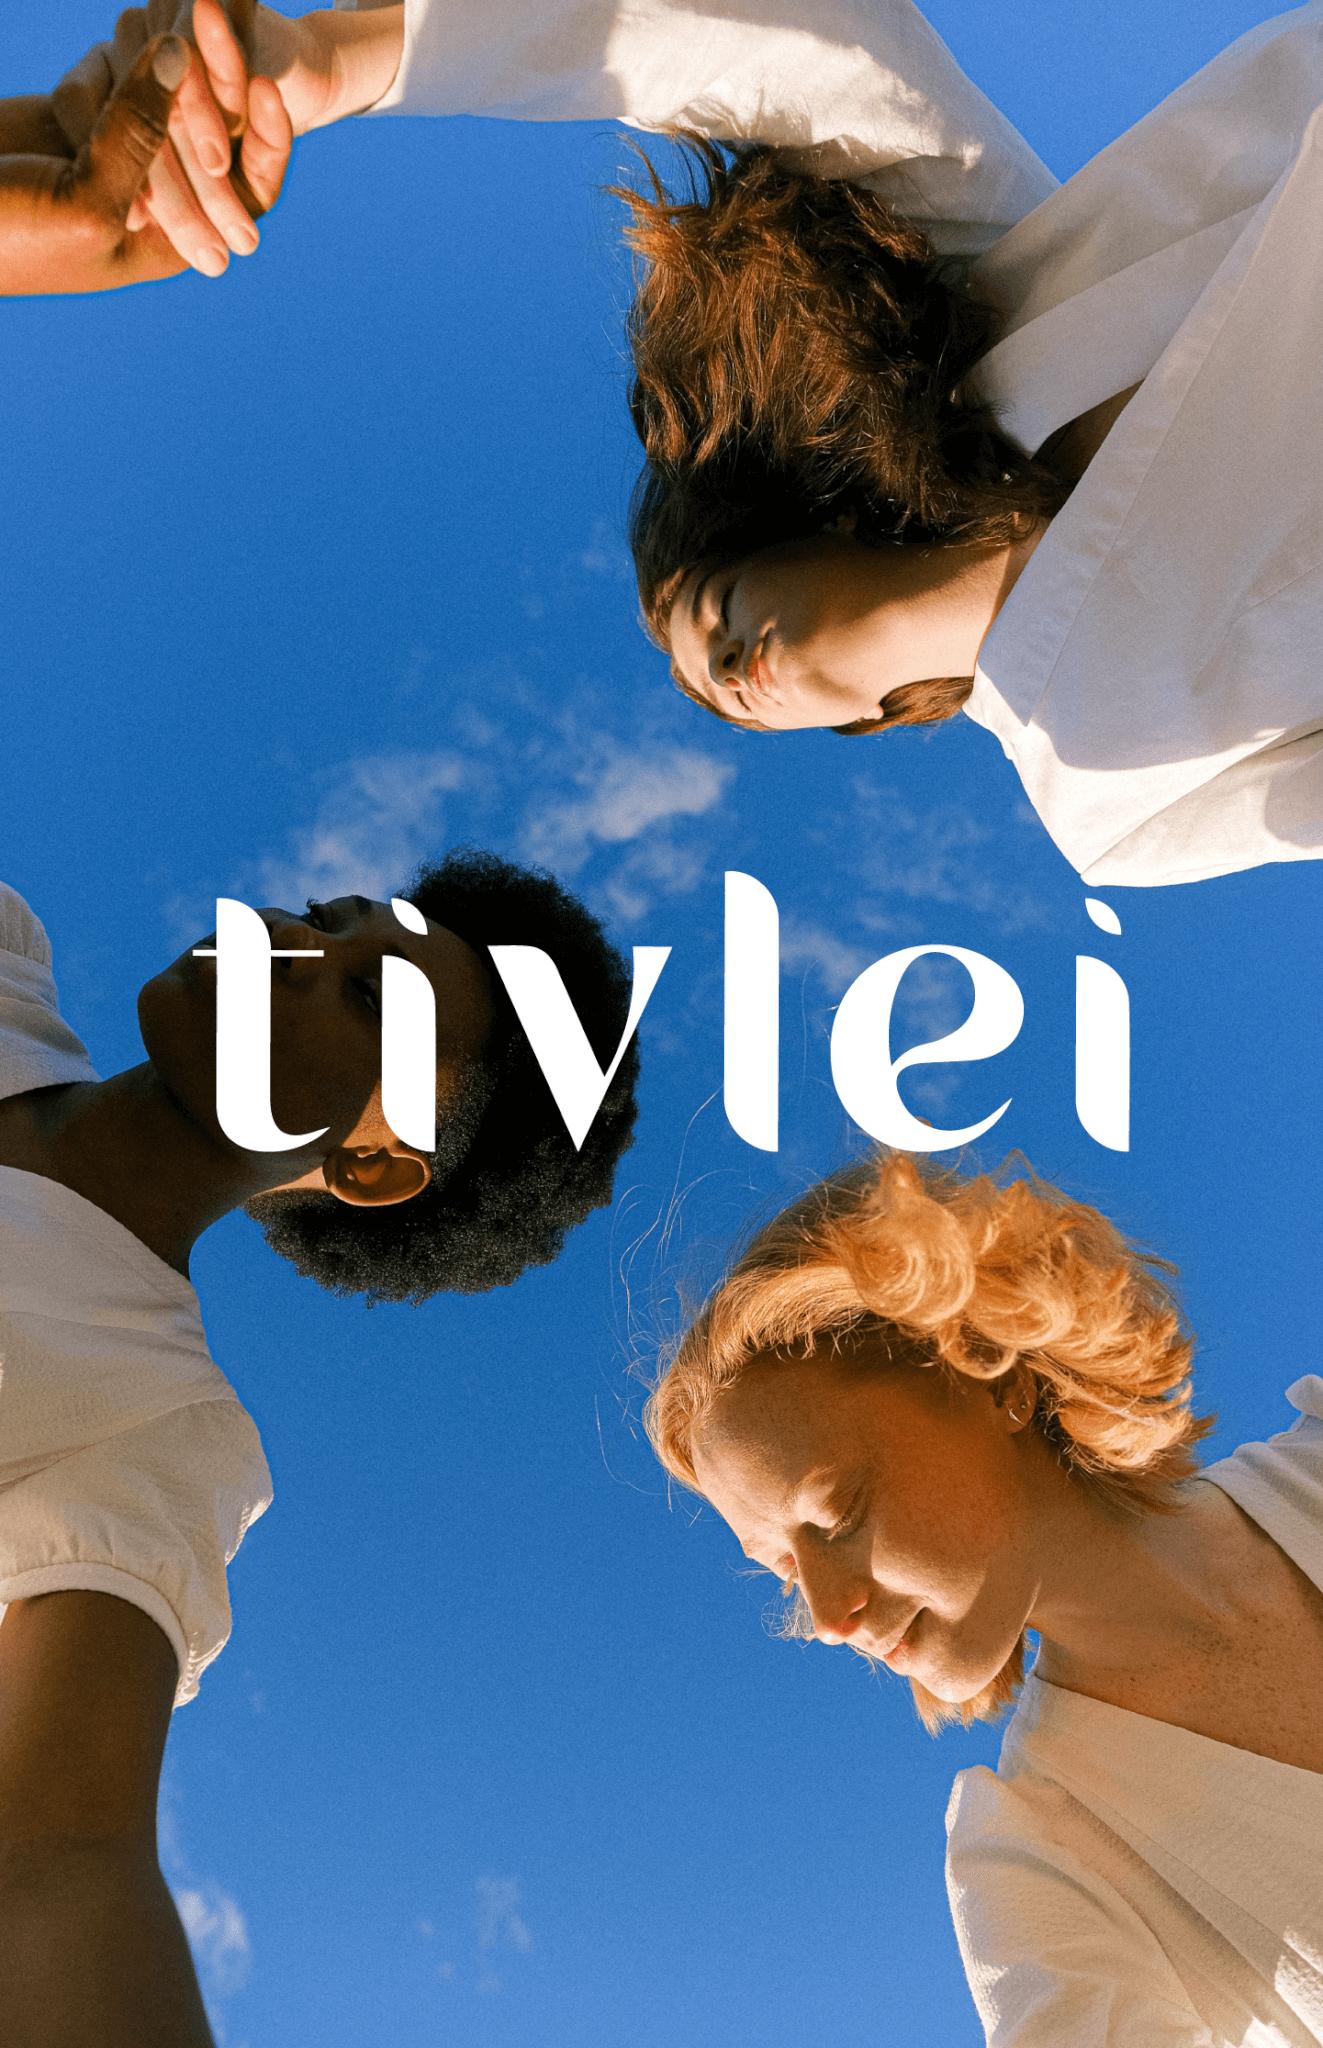 Tivlei-Aspen-Theory-05